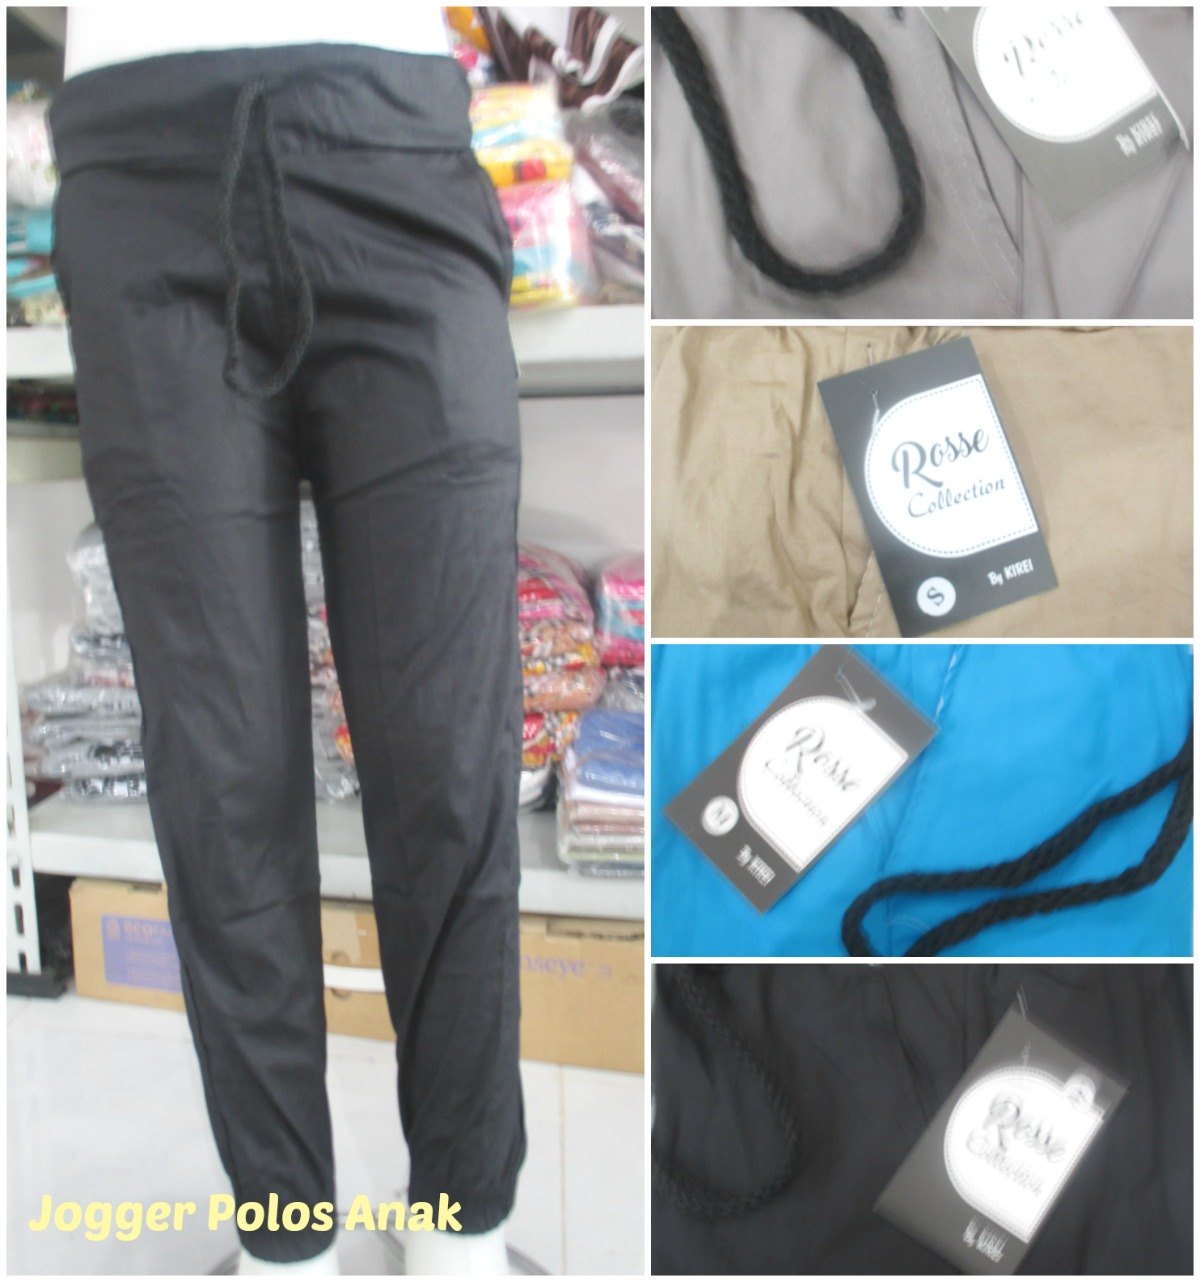 ObralanBaju.com Obral Baju Pakaian Murah Meriah 5000 Celana Kulot Jersey